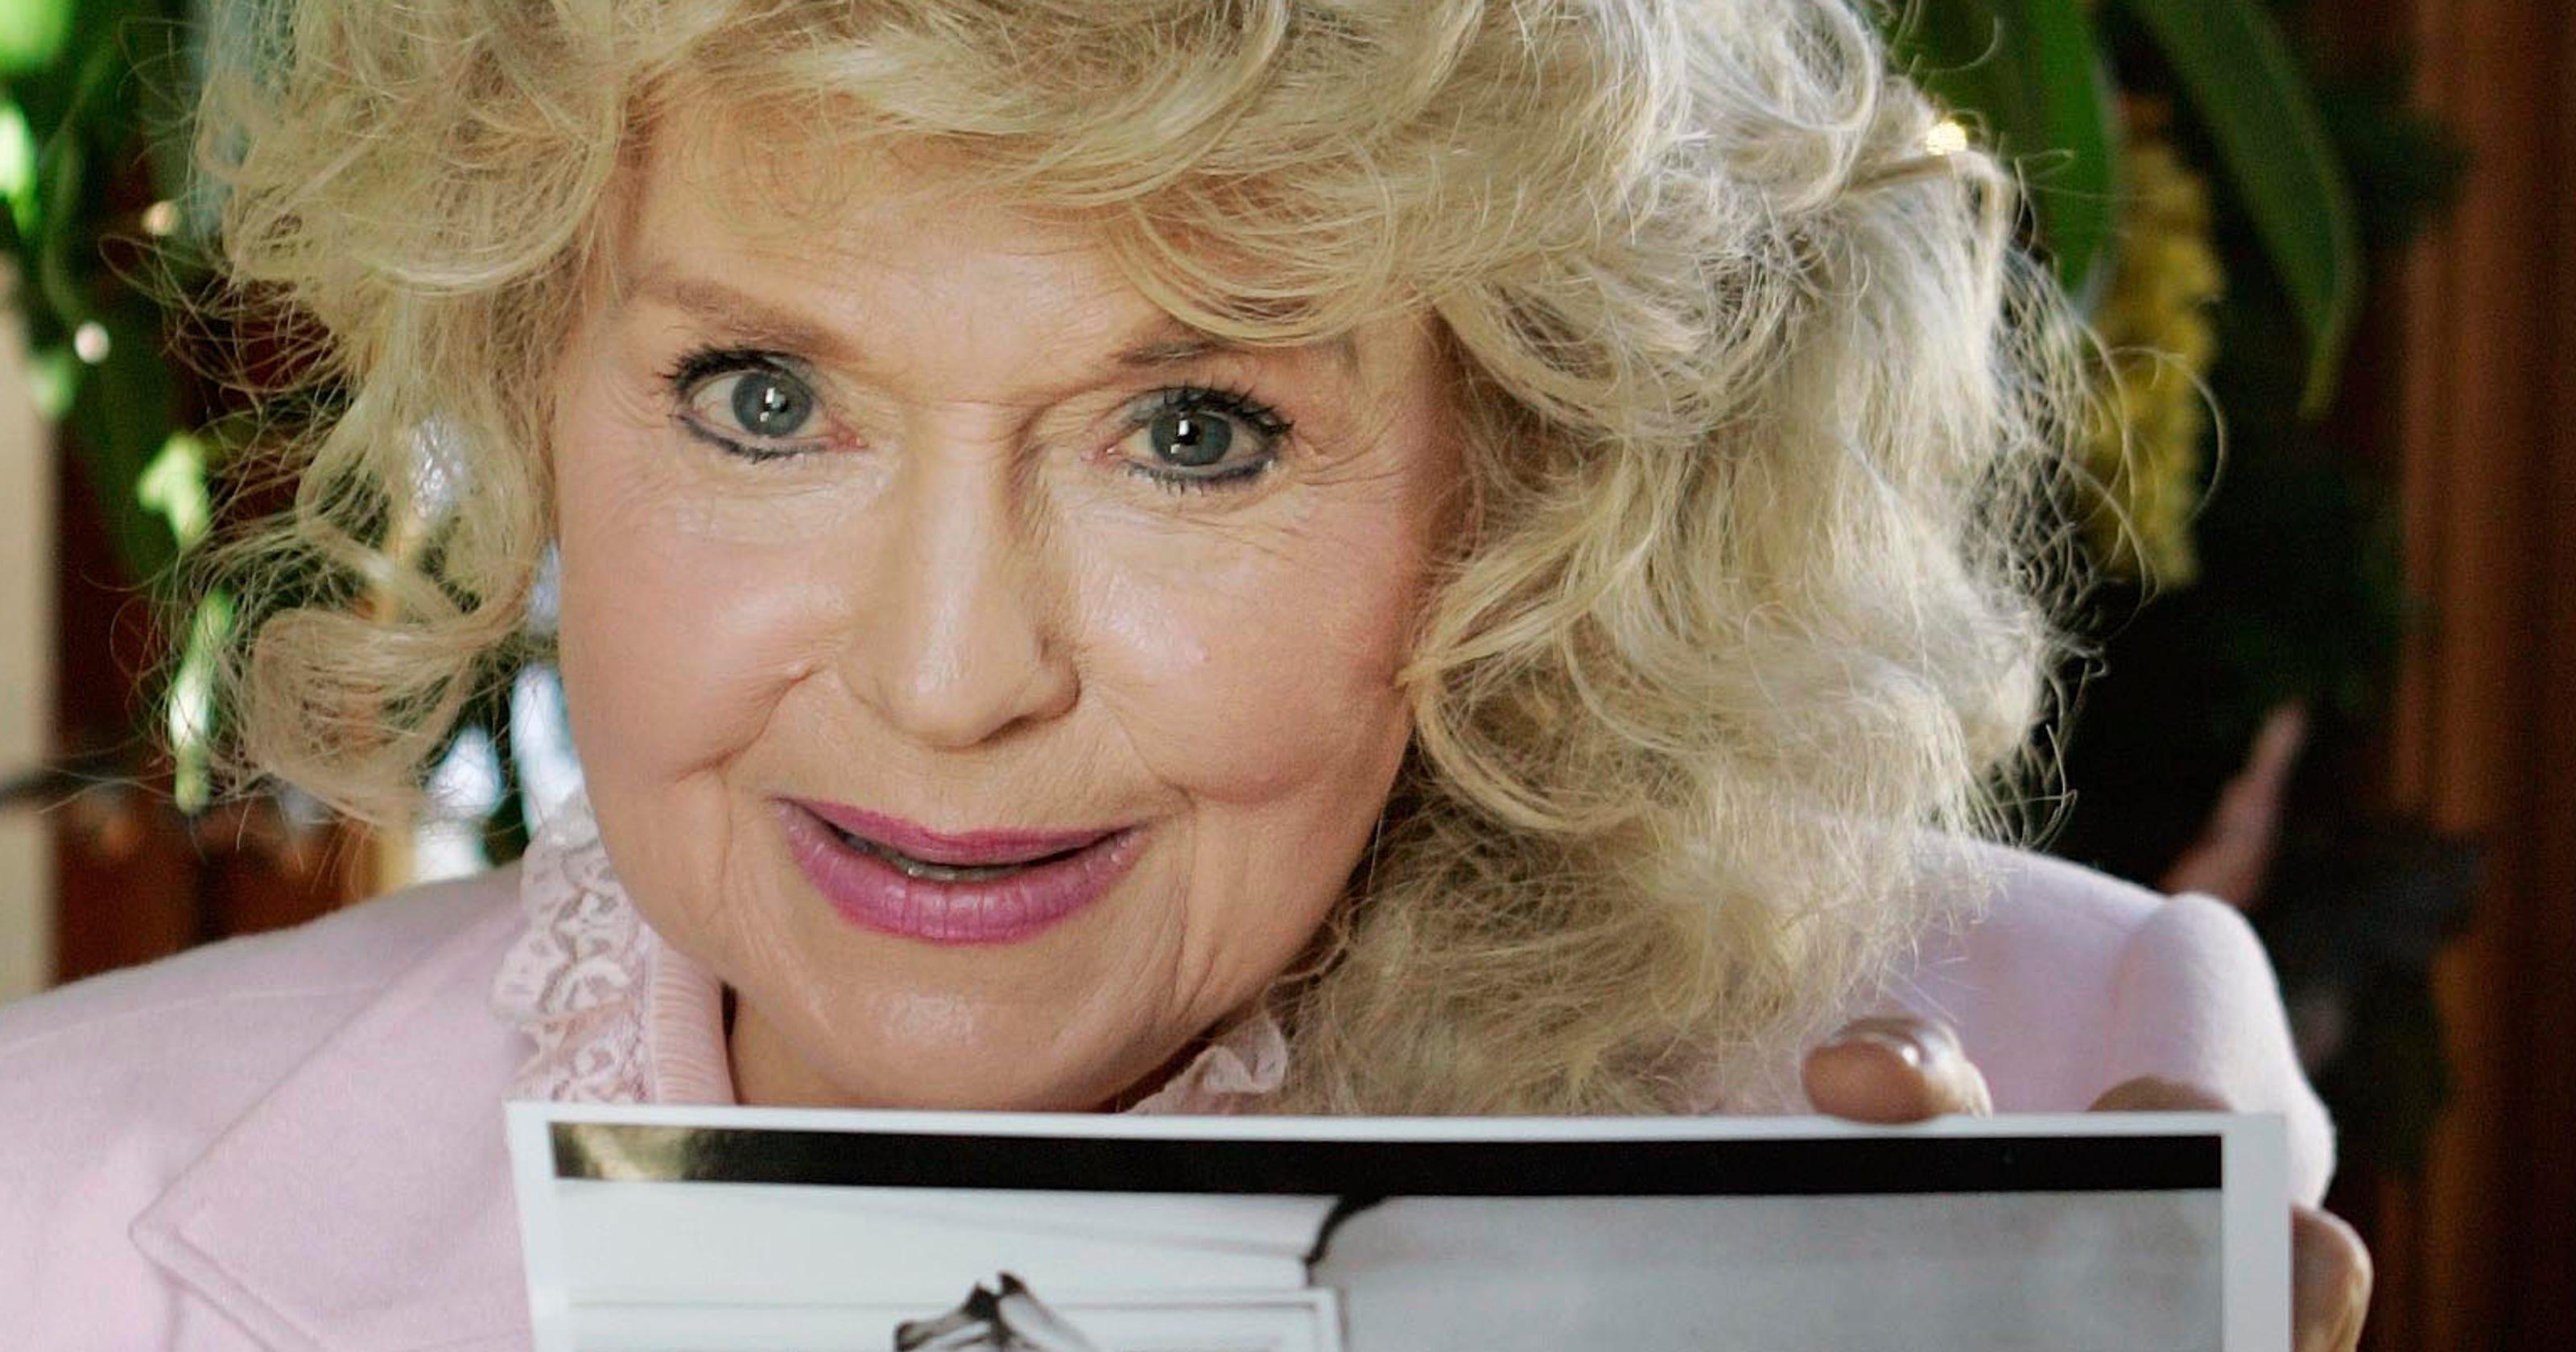 39 beverly hillbillies 39 star donna douglas dies at 82. Black Bedroom Furniture Sets. Home Design Ideas